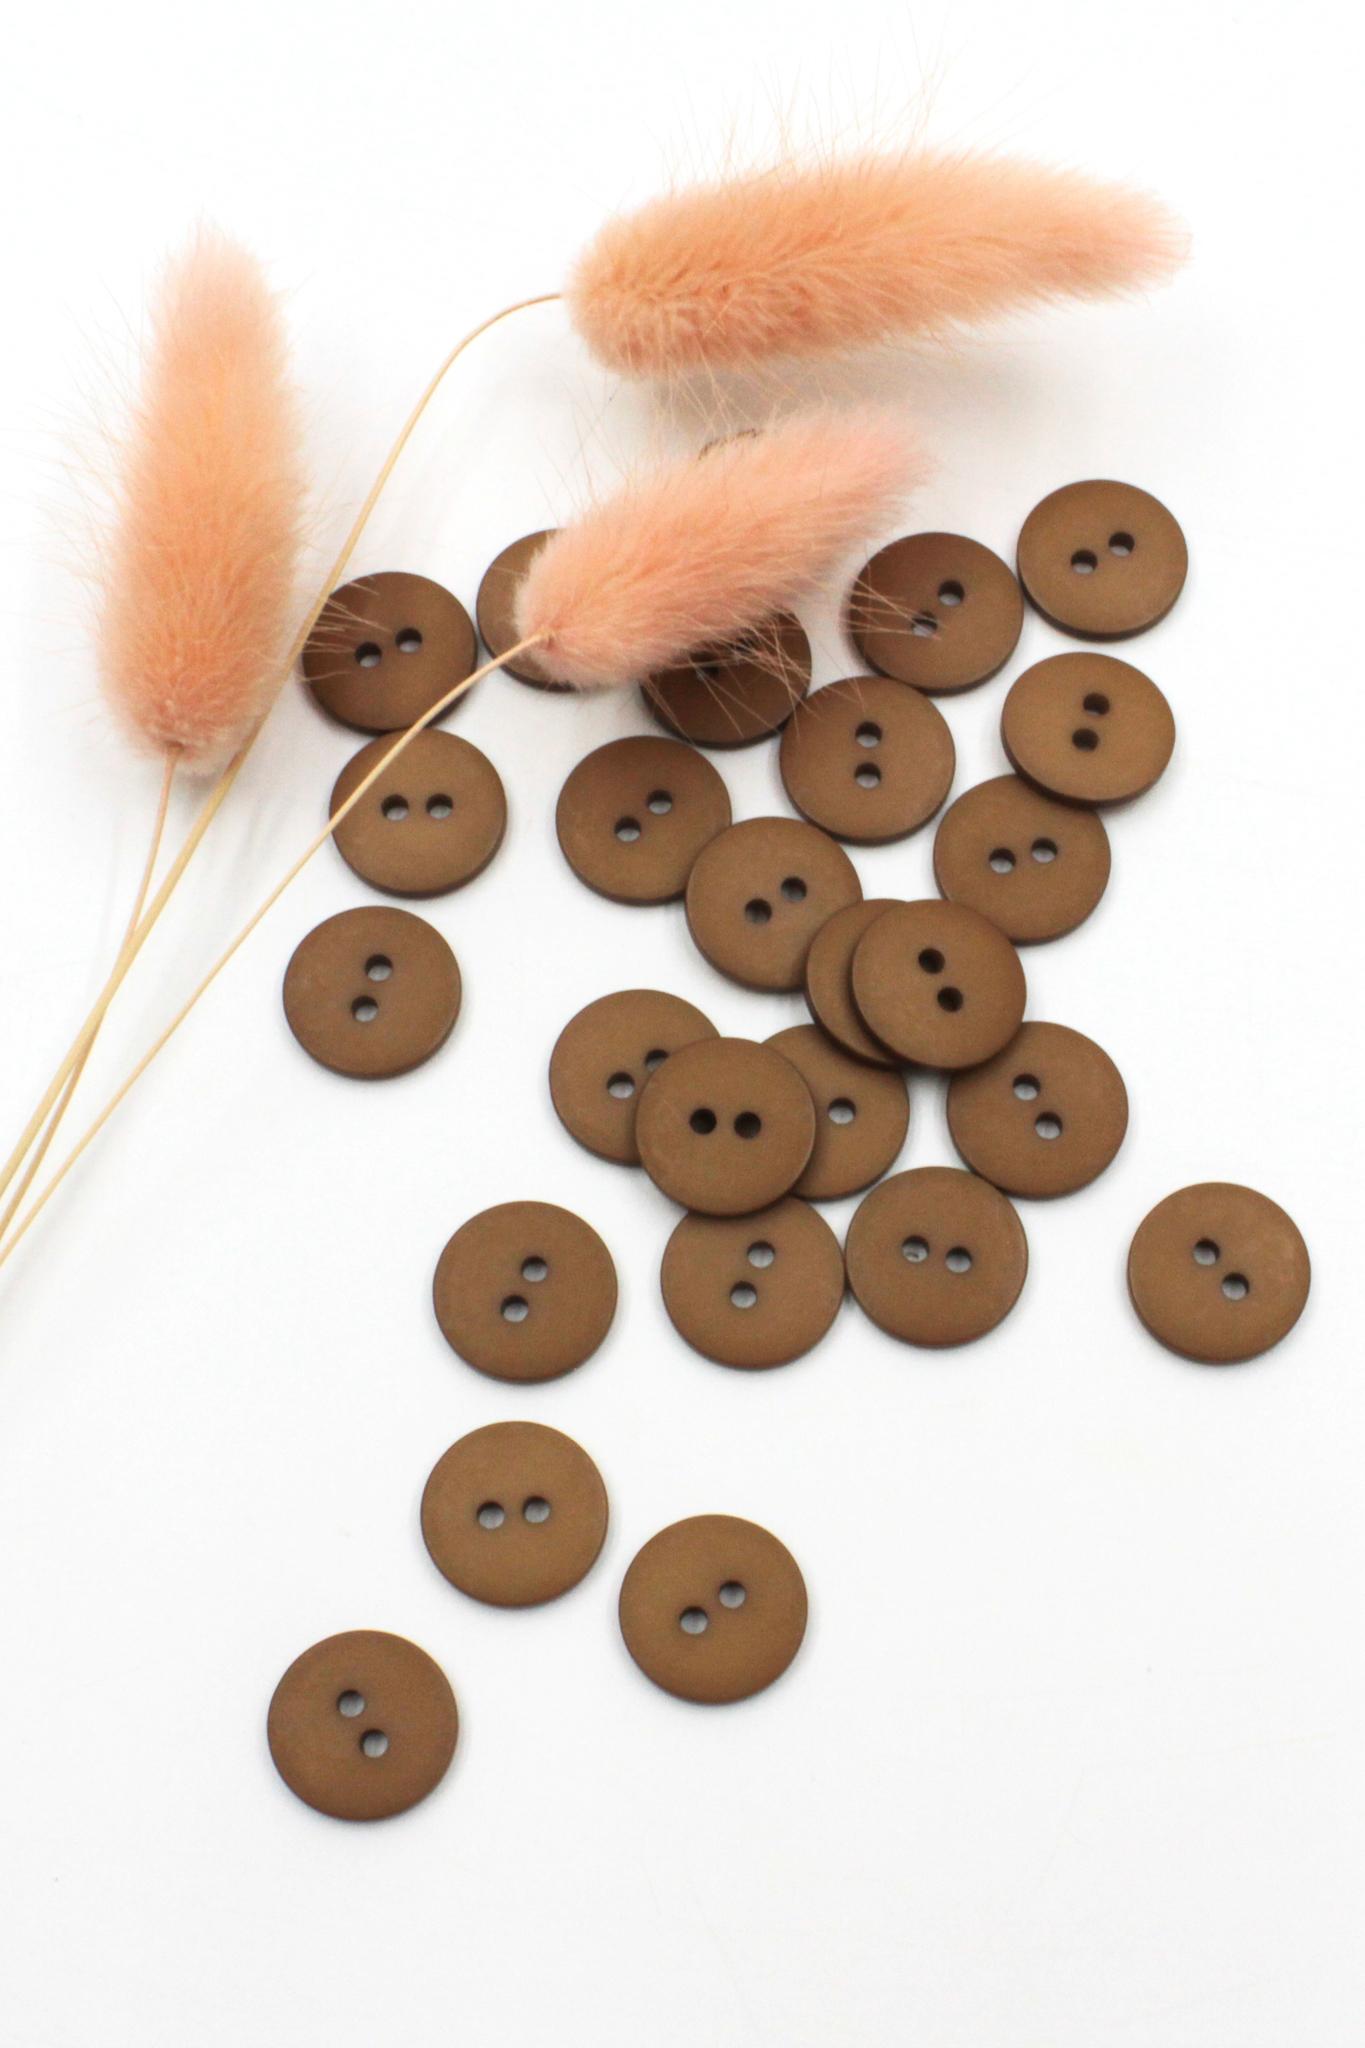 Пуговица,пластик,лесной орех,14 мм